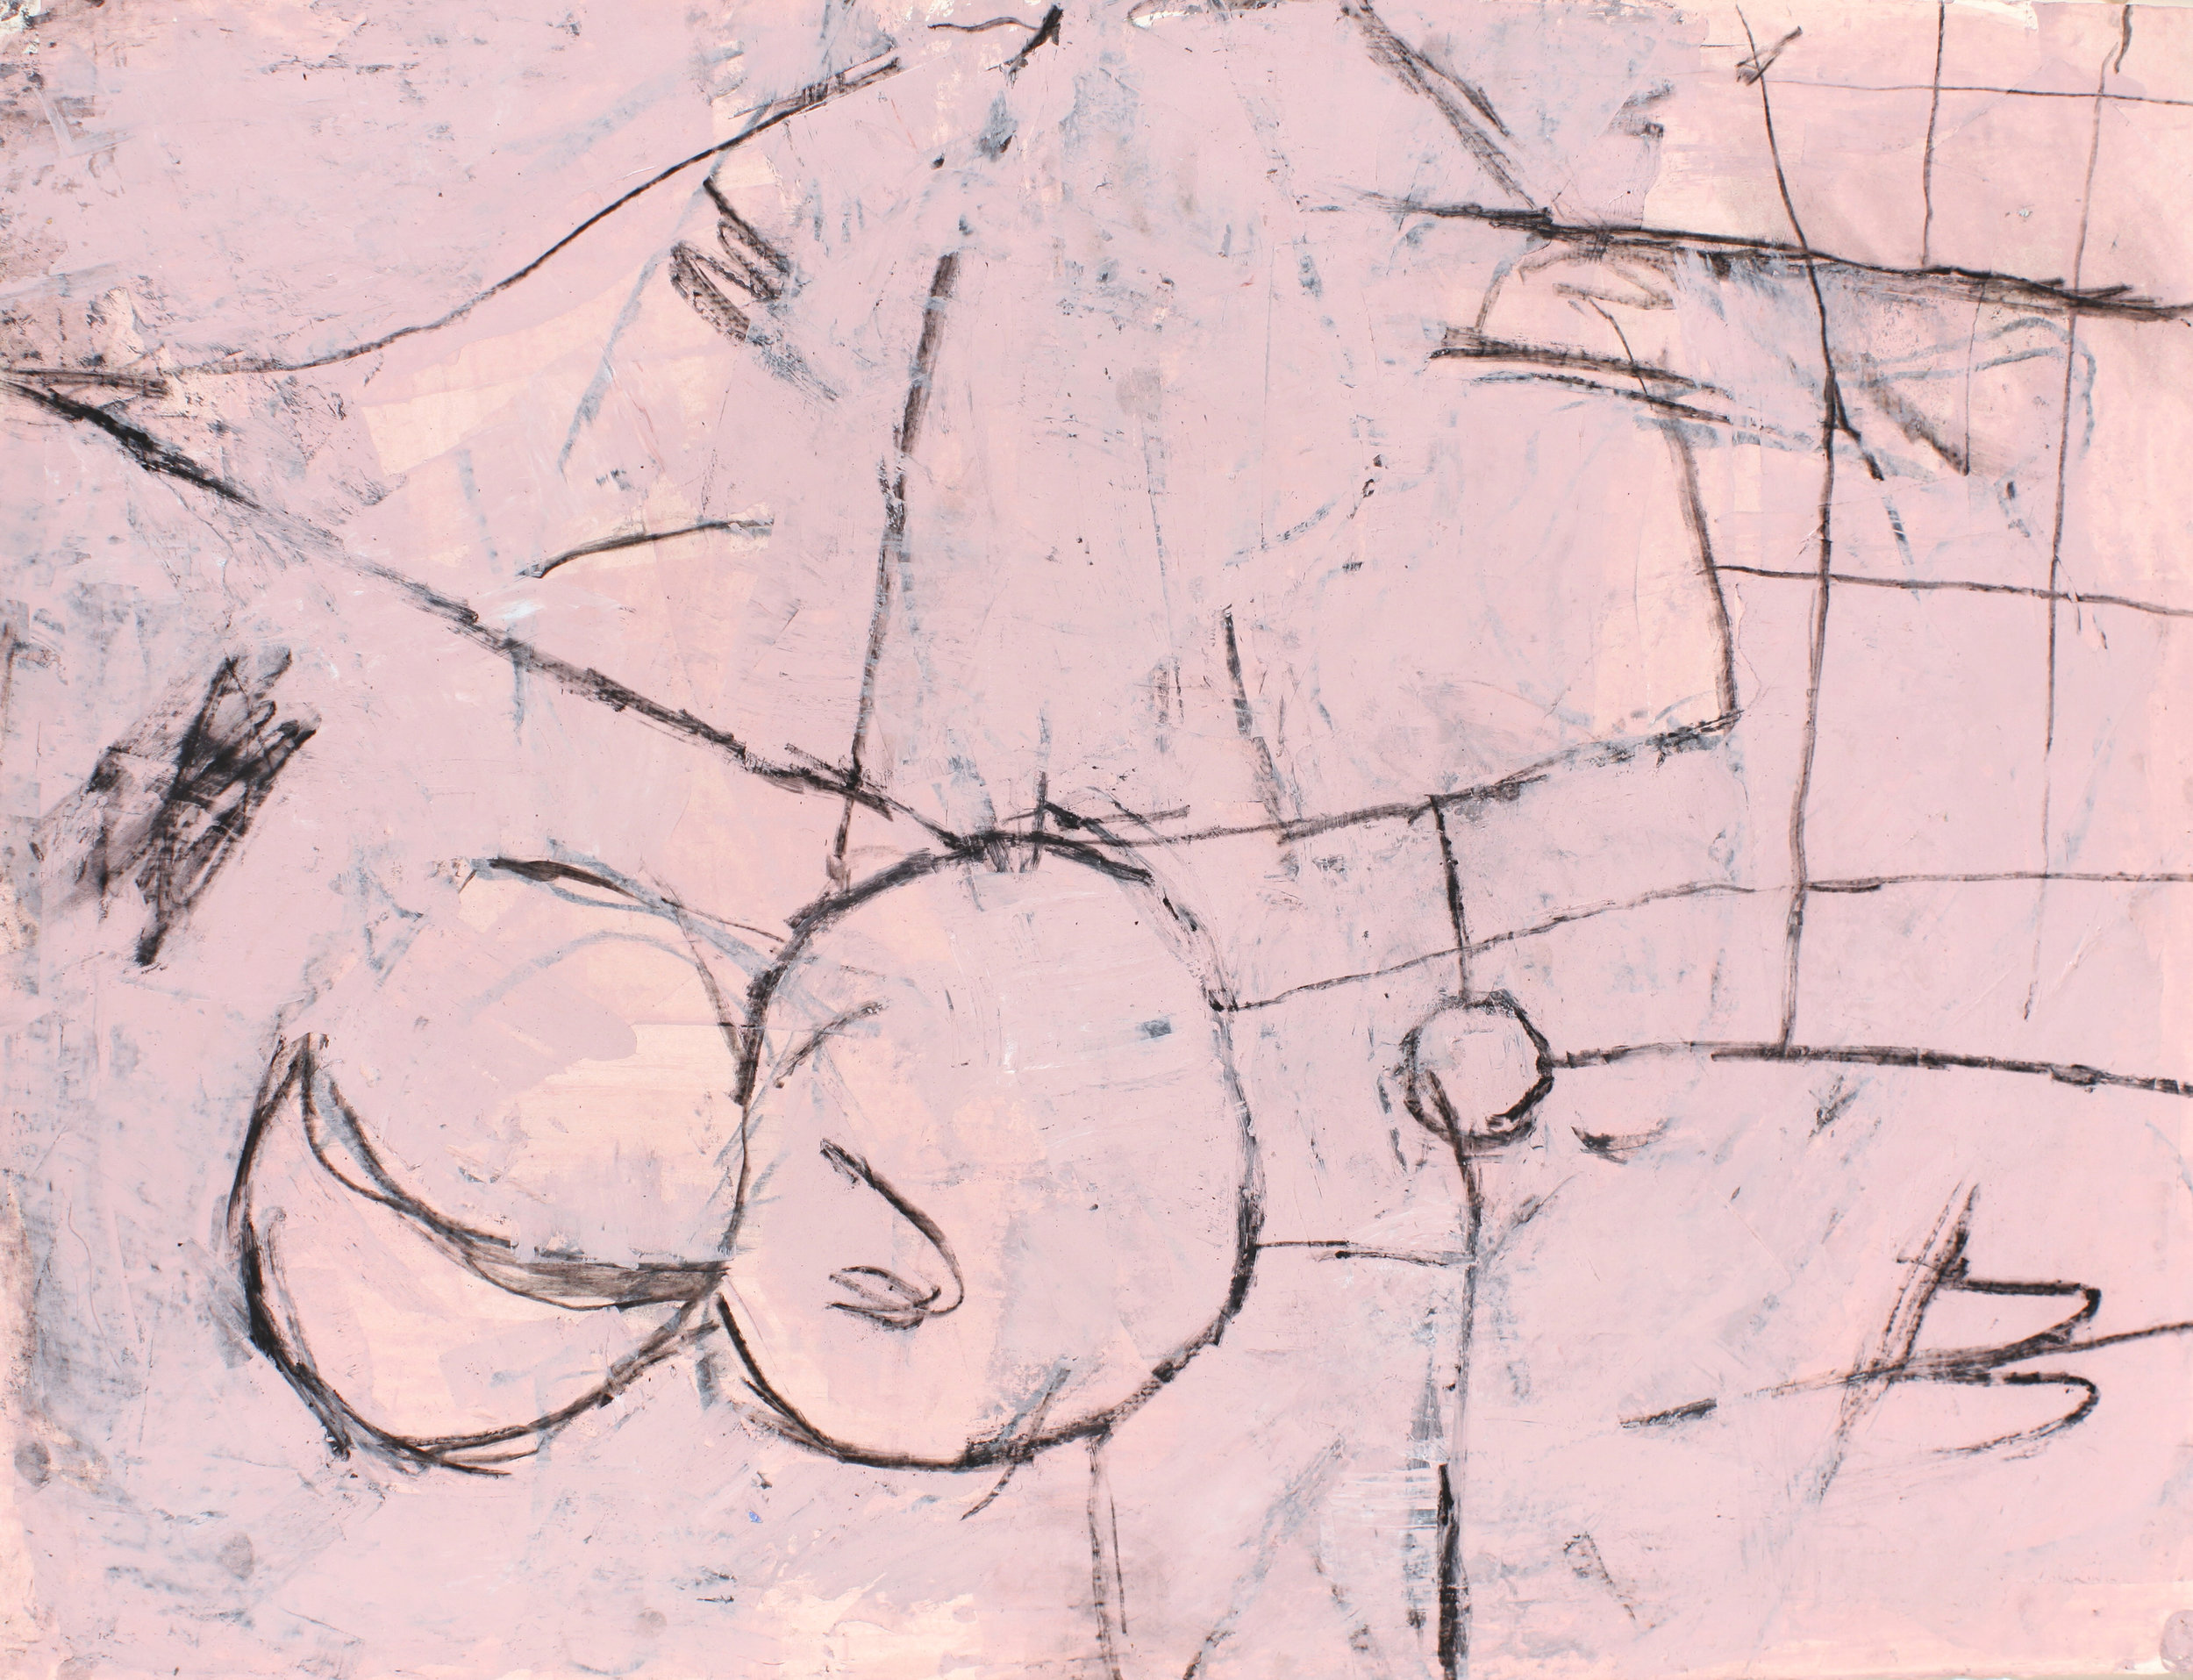 1983_UntitledNo8304_acrylicandcharcoalonpaper_22x30_WPNF046.jpg